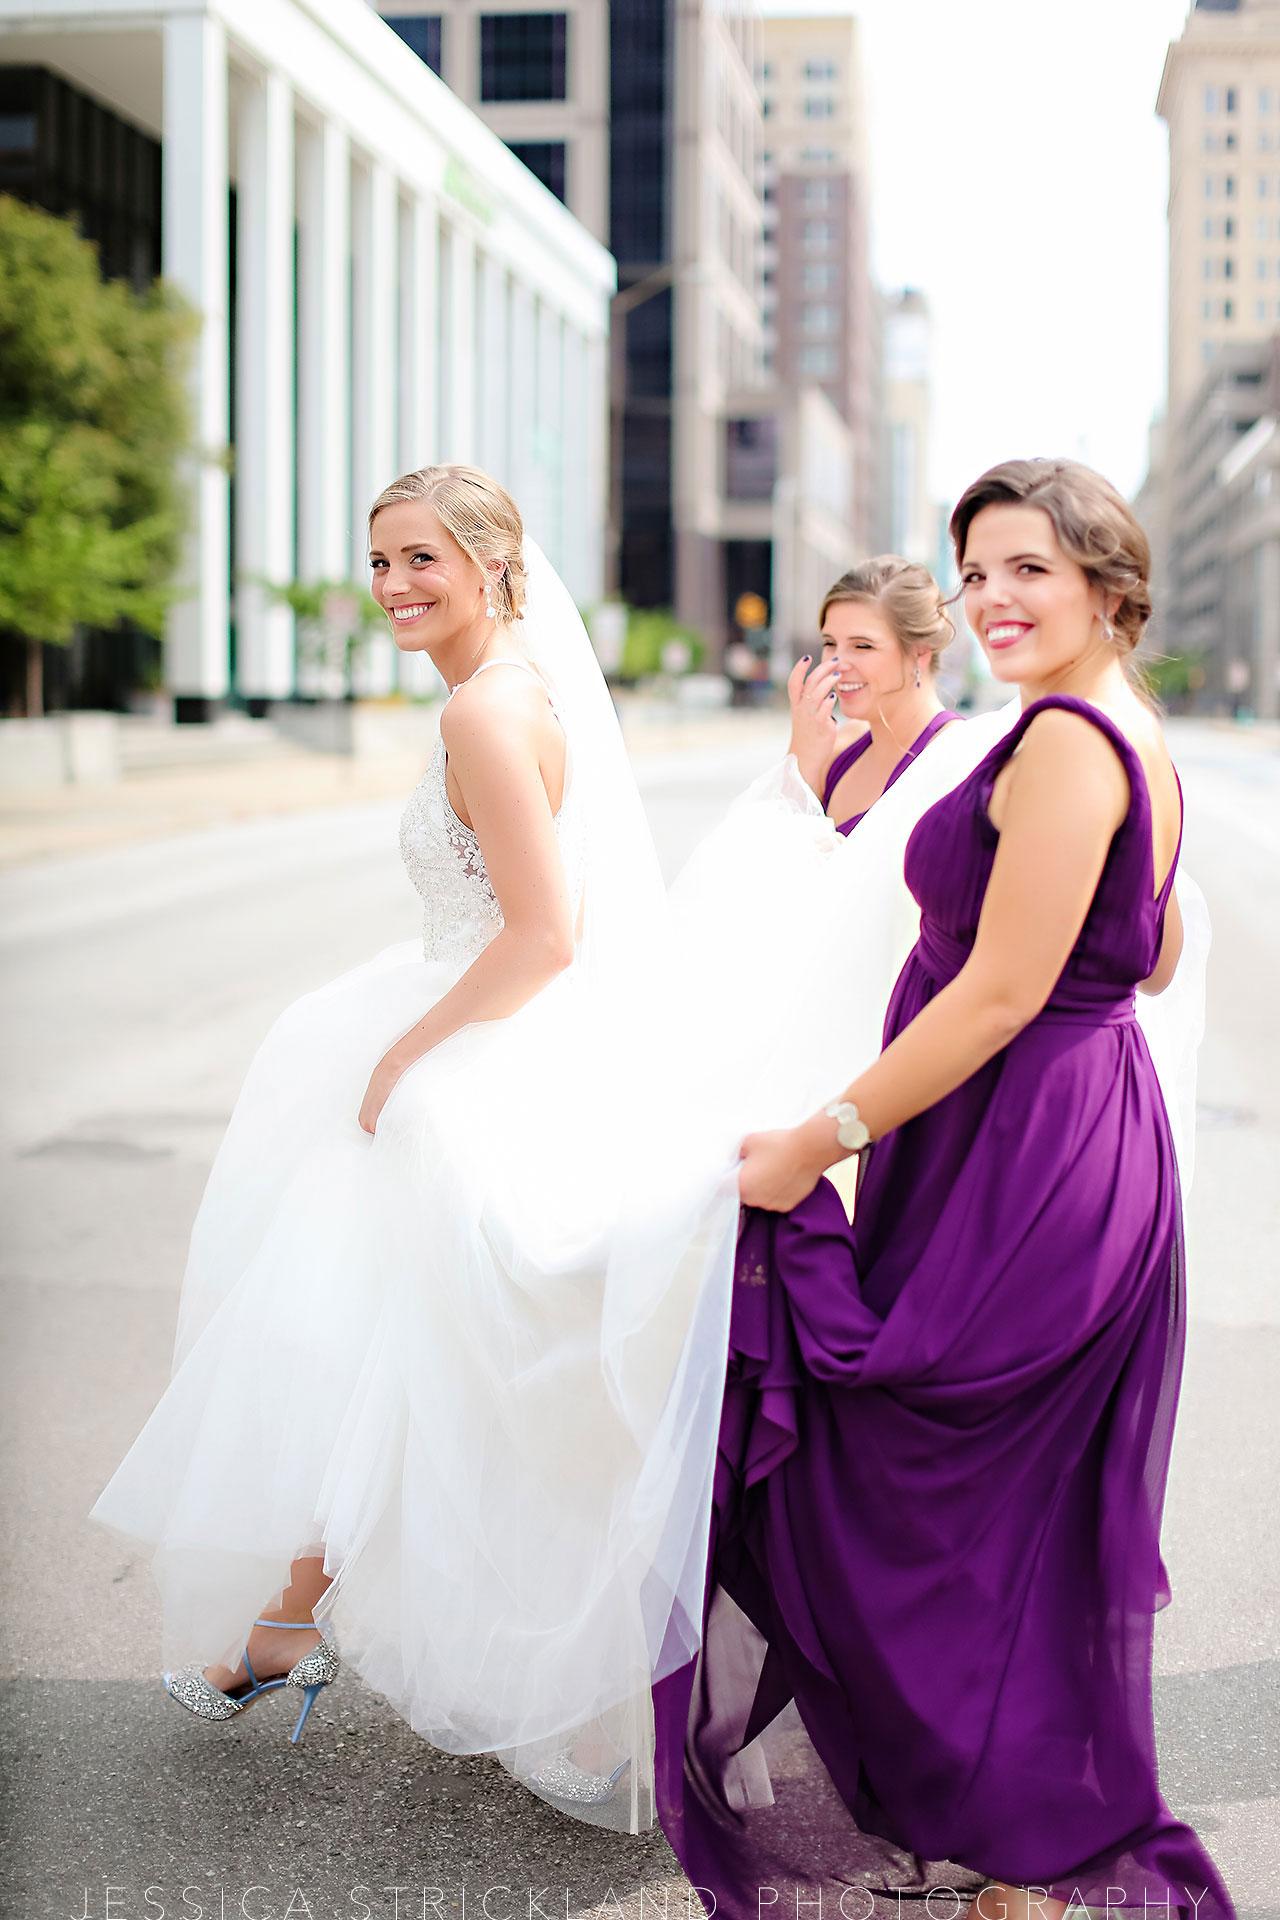 Serra Alex Regions Tower Indianapolis Wedding 126 watermarked